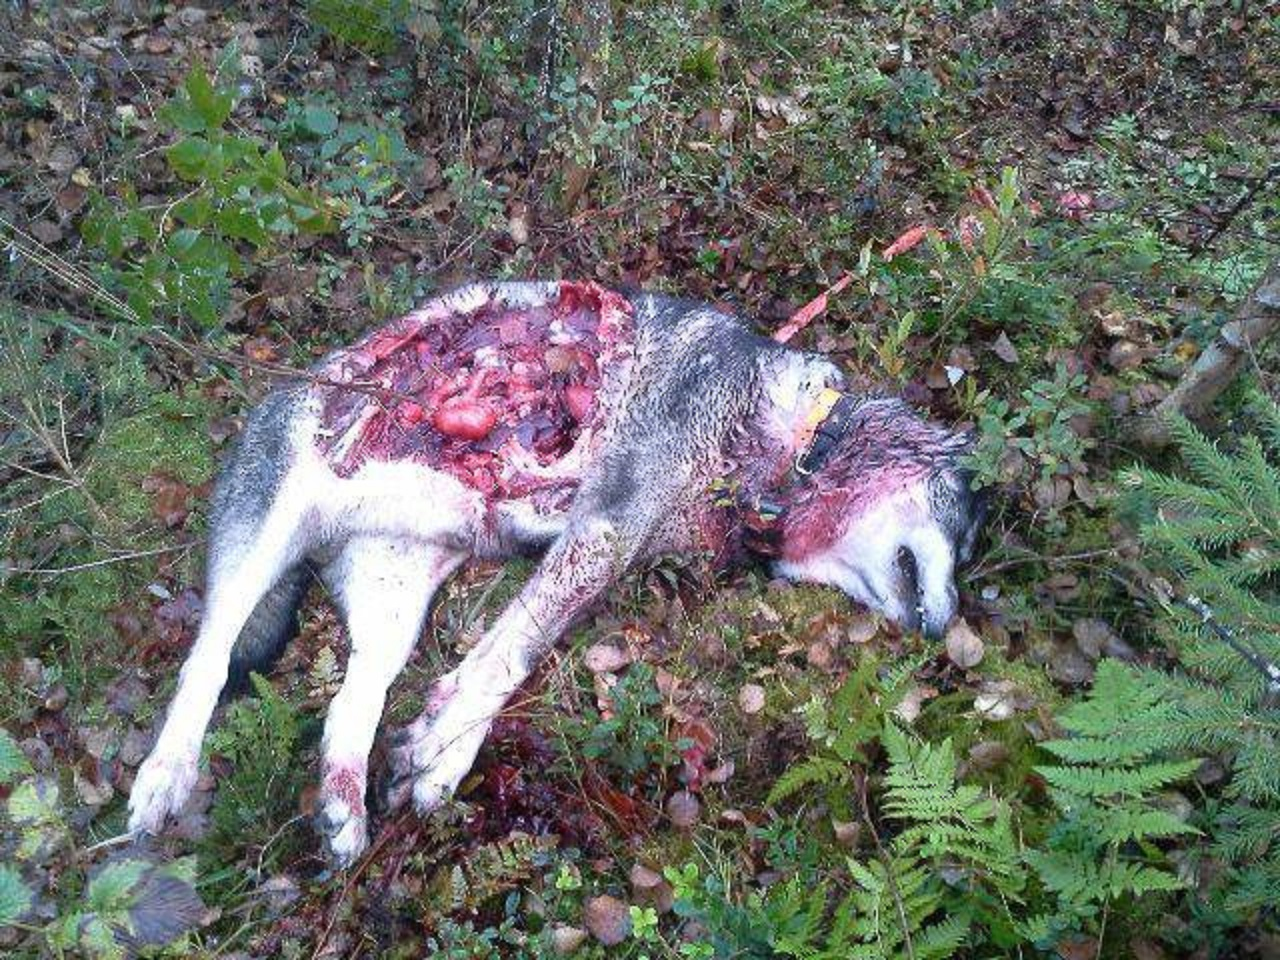 Imposing Swedish Elkhound Killed By Wolves Swedish Elkhound Killed By Wolves History Dog Vs Wolf Fight Liveleak Dog Vs Wolf Reddit bark post Dog Vs Wolf